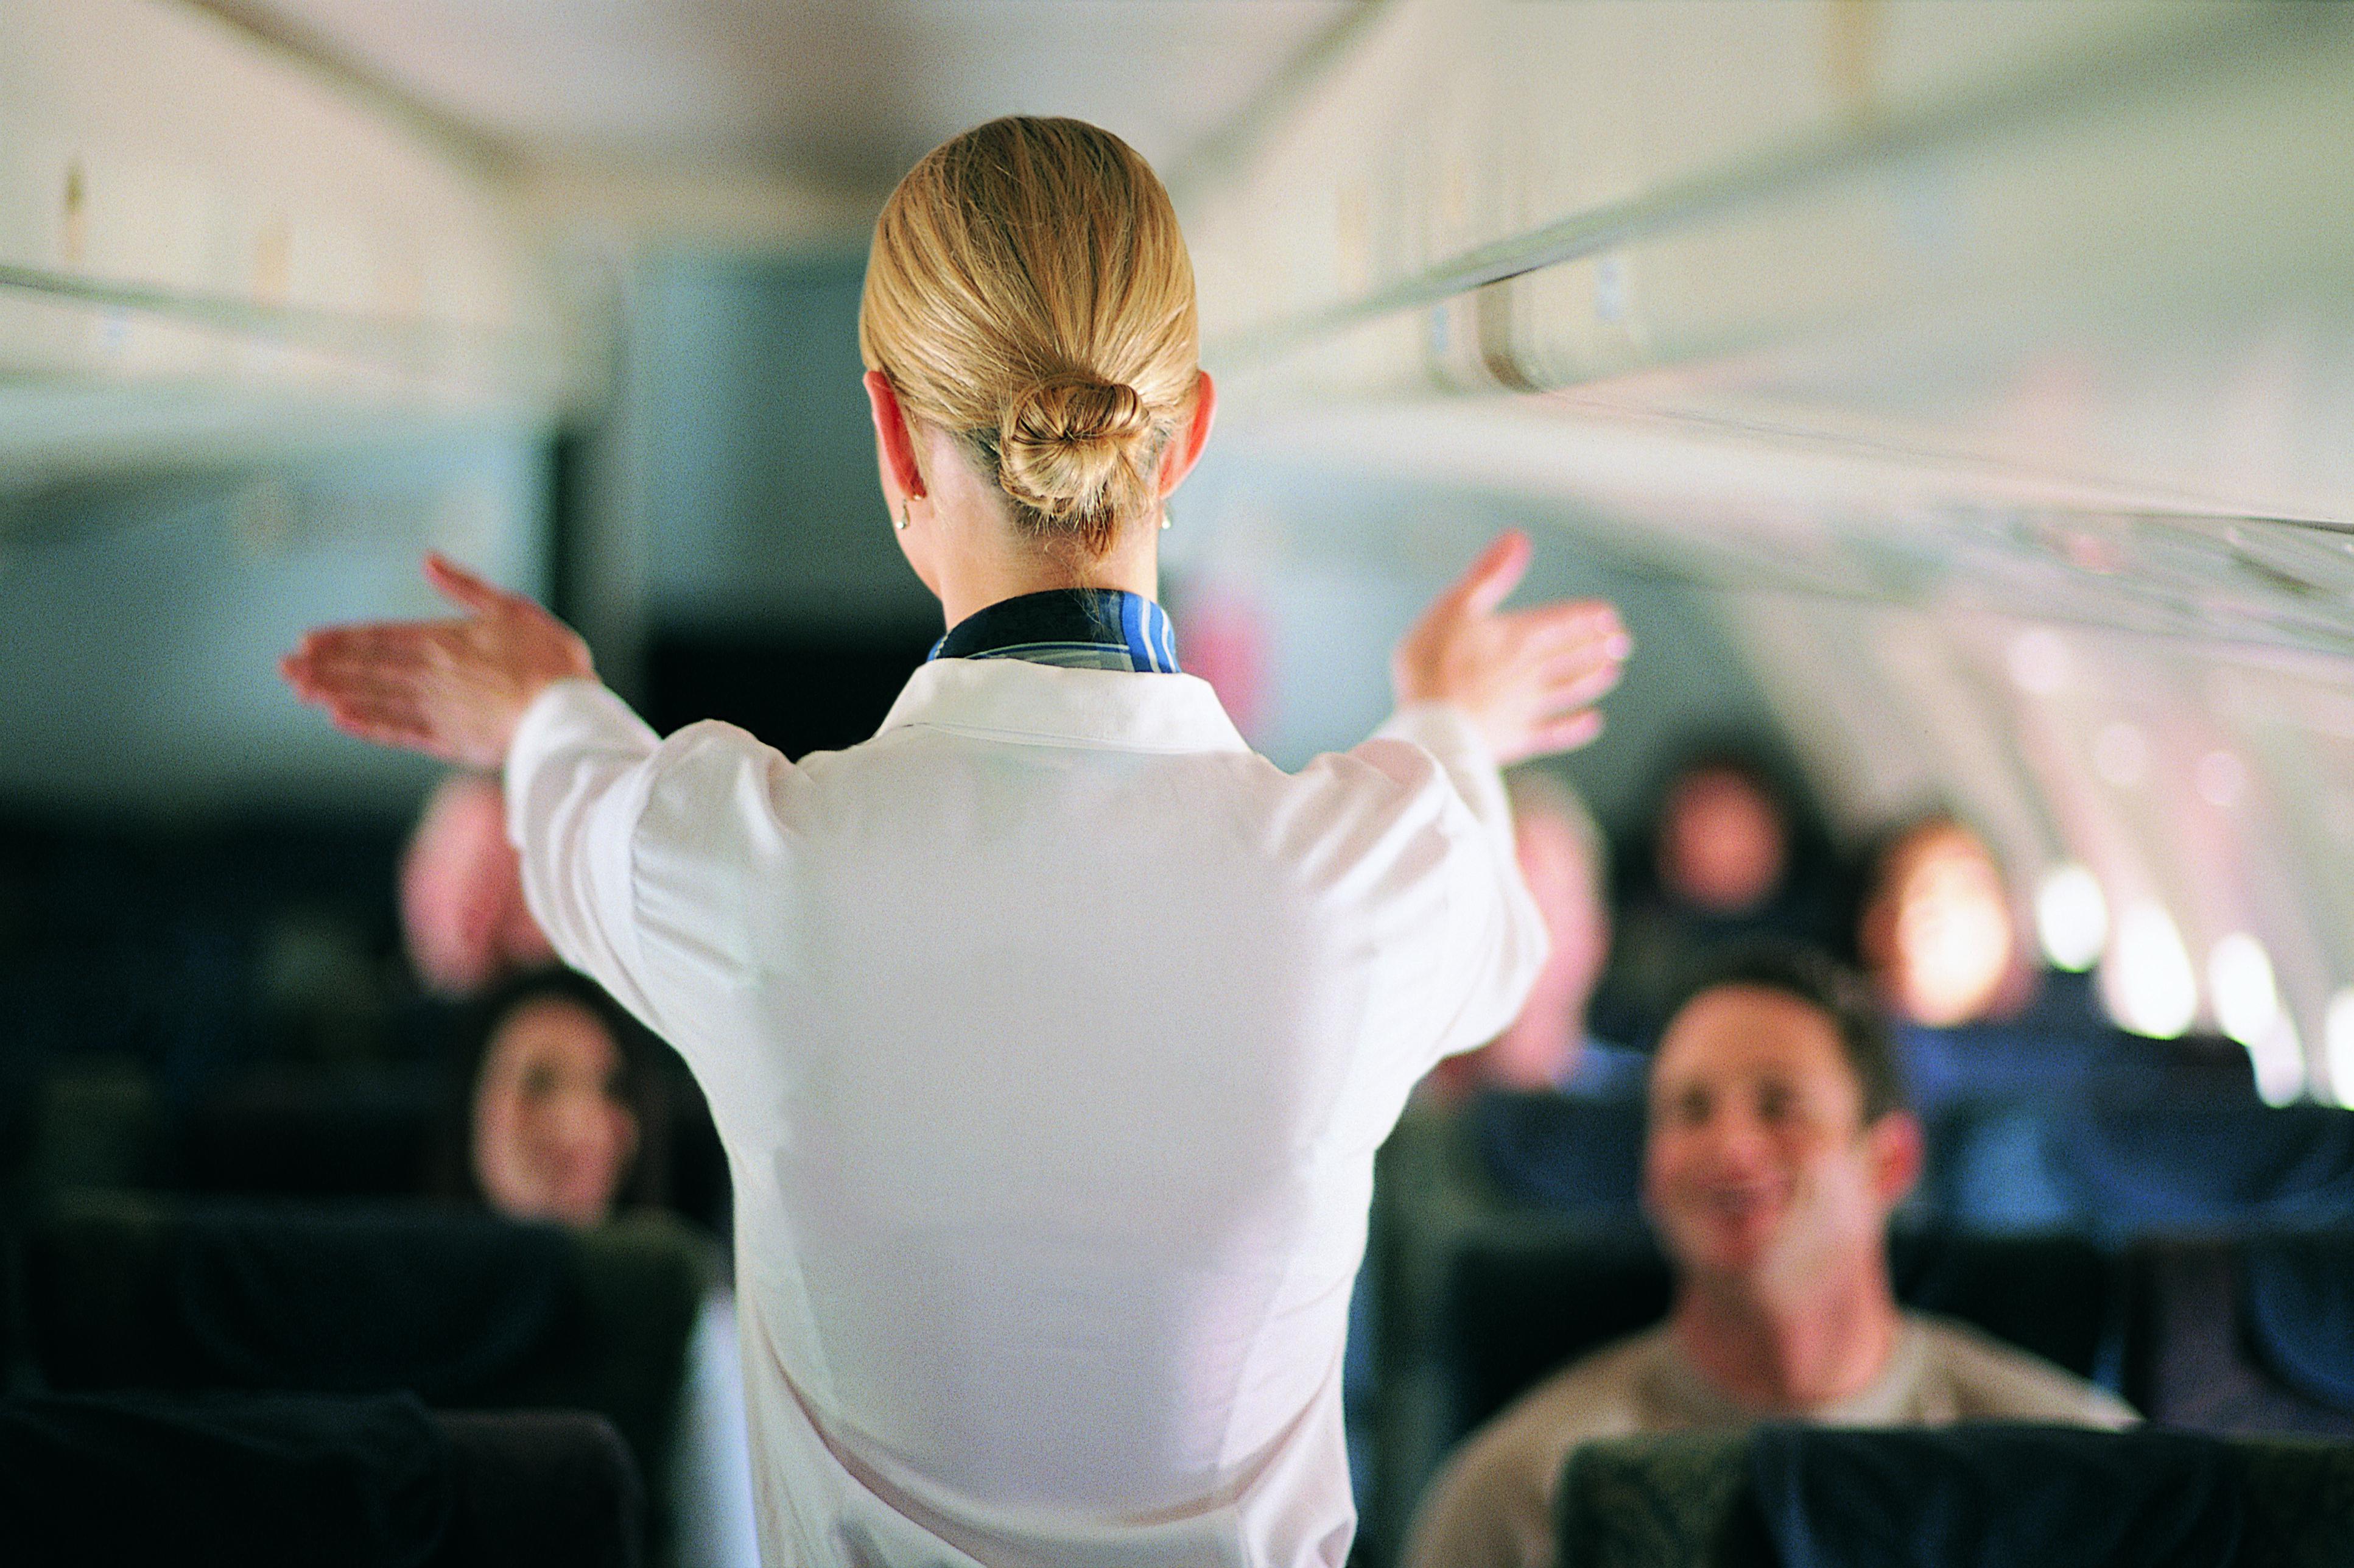 Sex on the flight deck